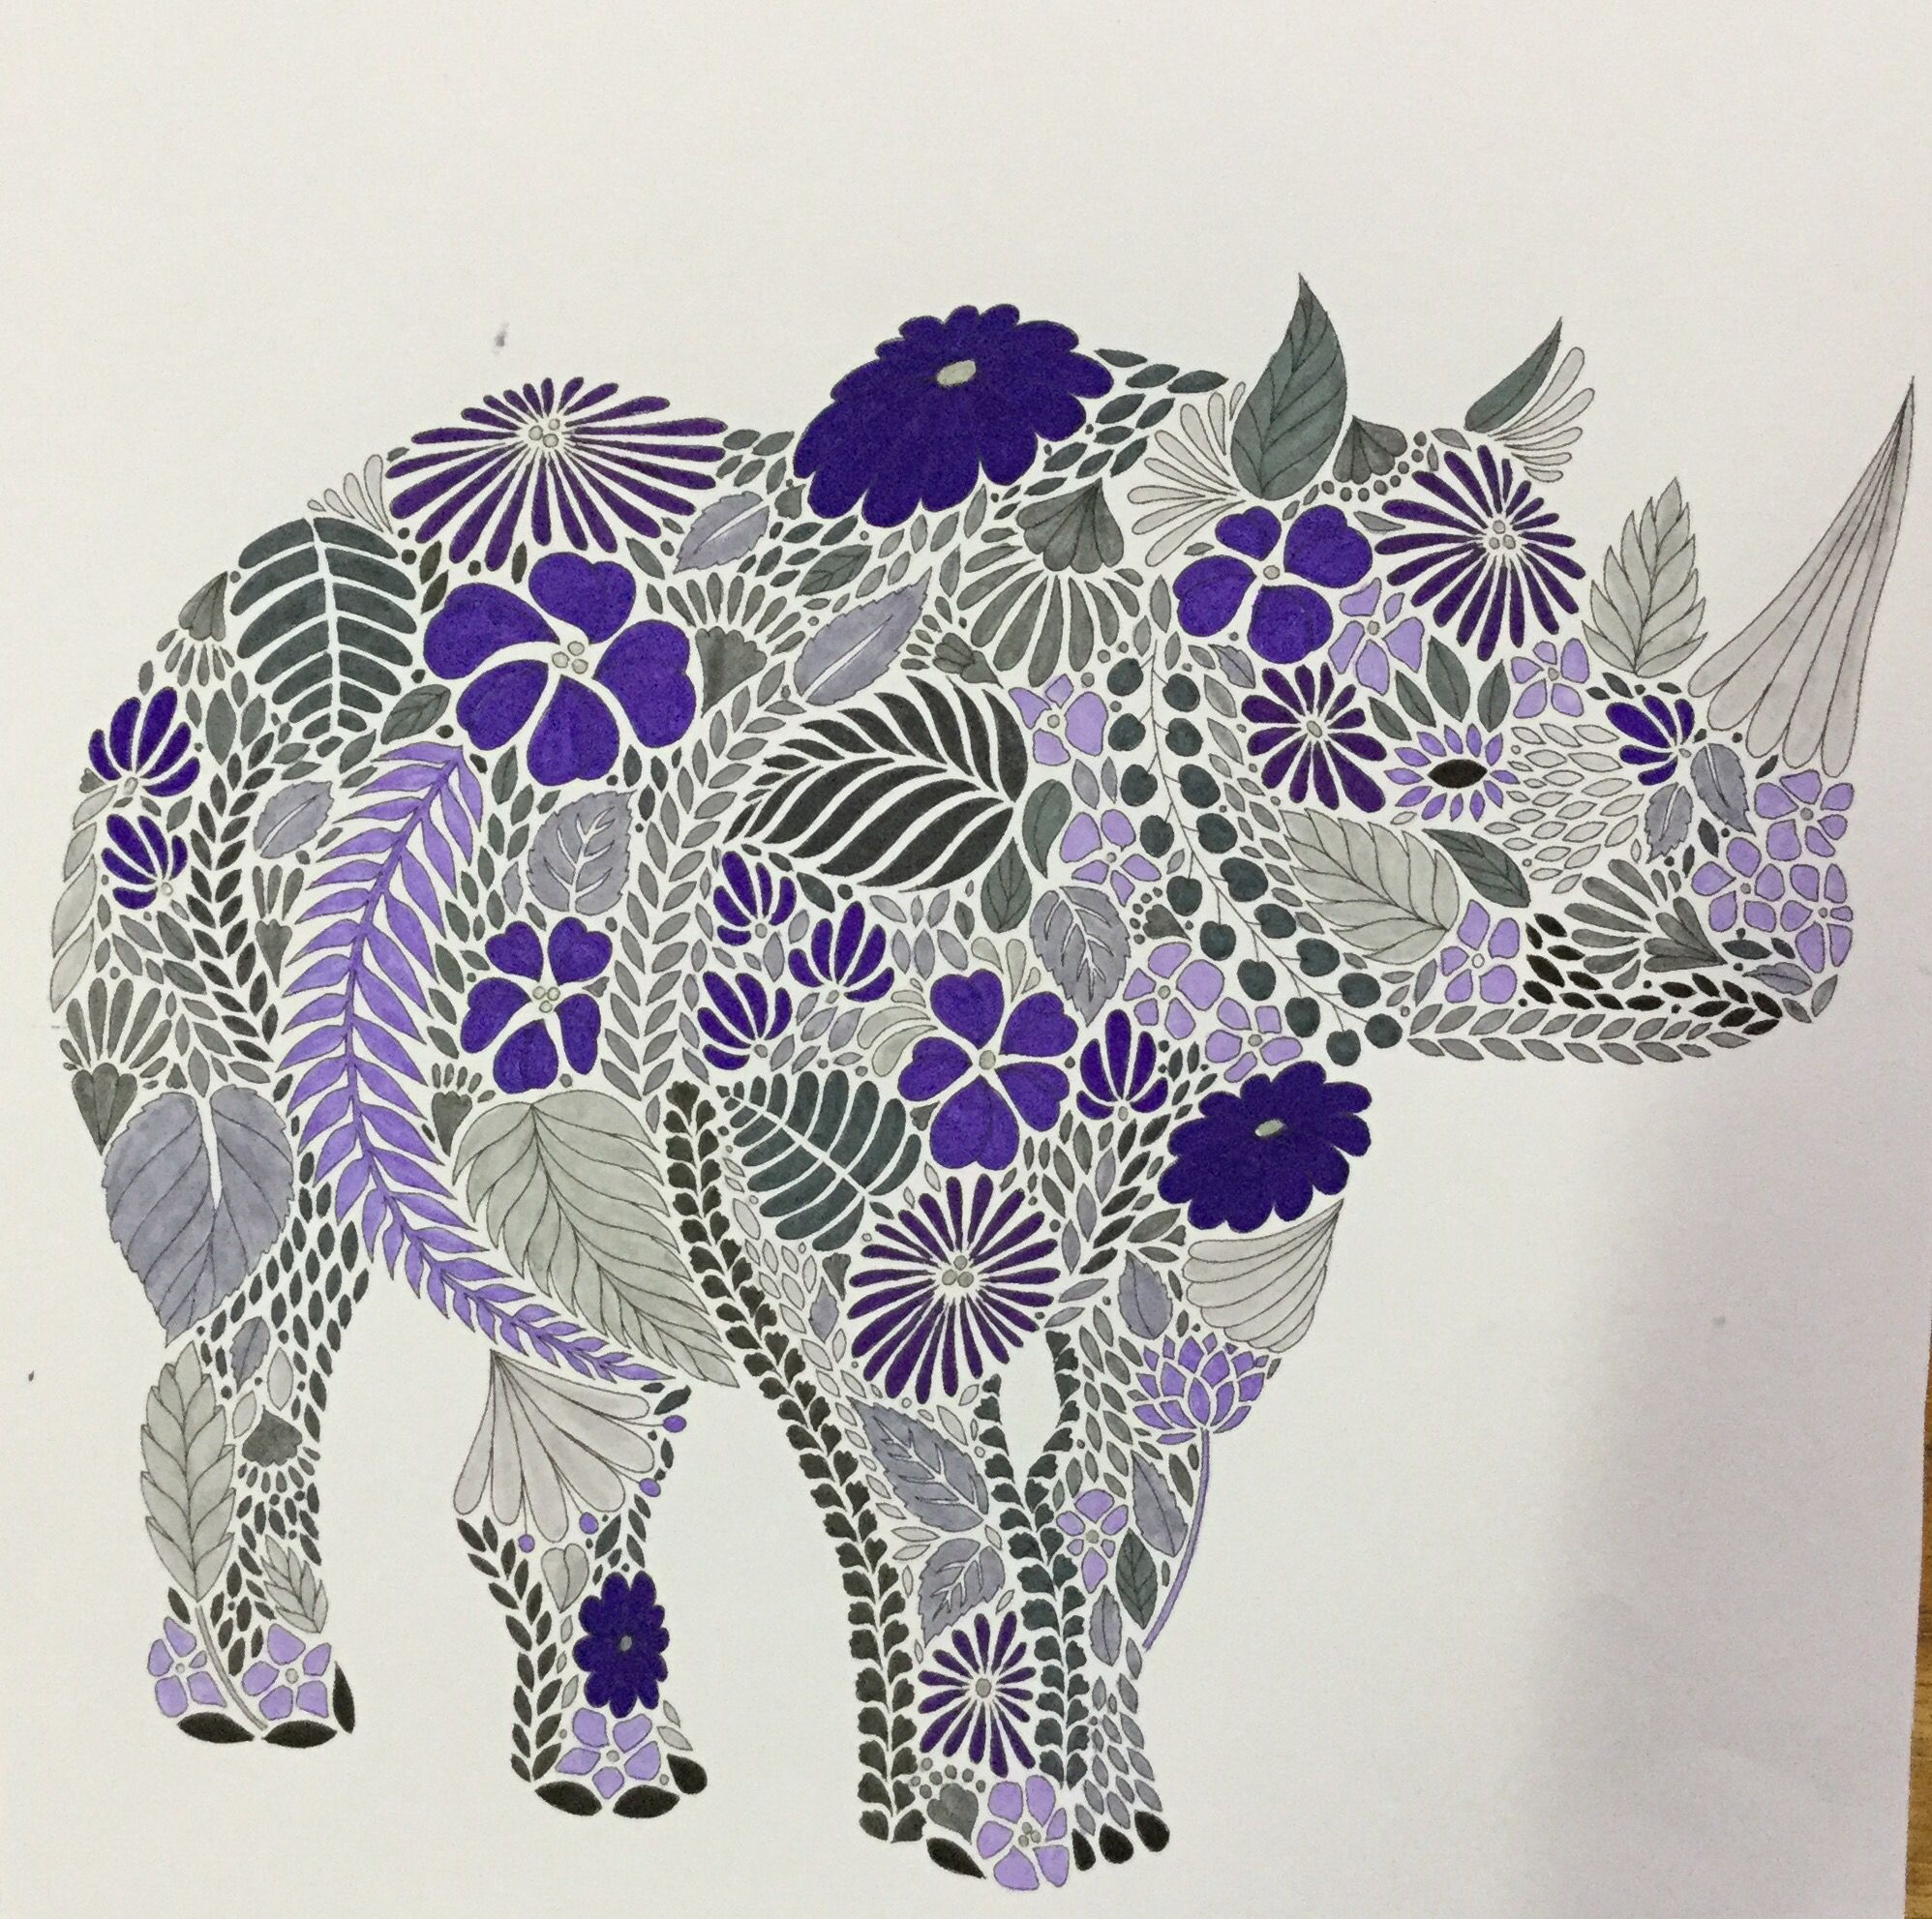 Colouring Millie Marotta Rhinoceros Adult ColoringColoring BooksRhinocerosAnimal KingdomTatooDoodlesBibleTropical